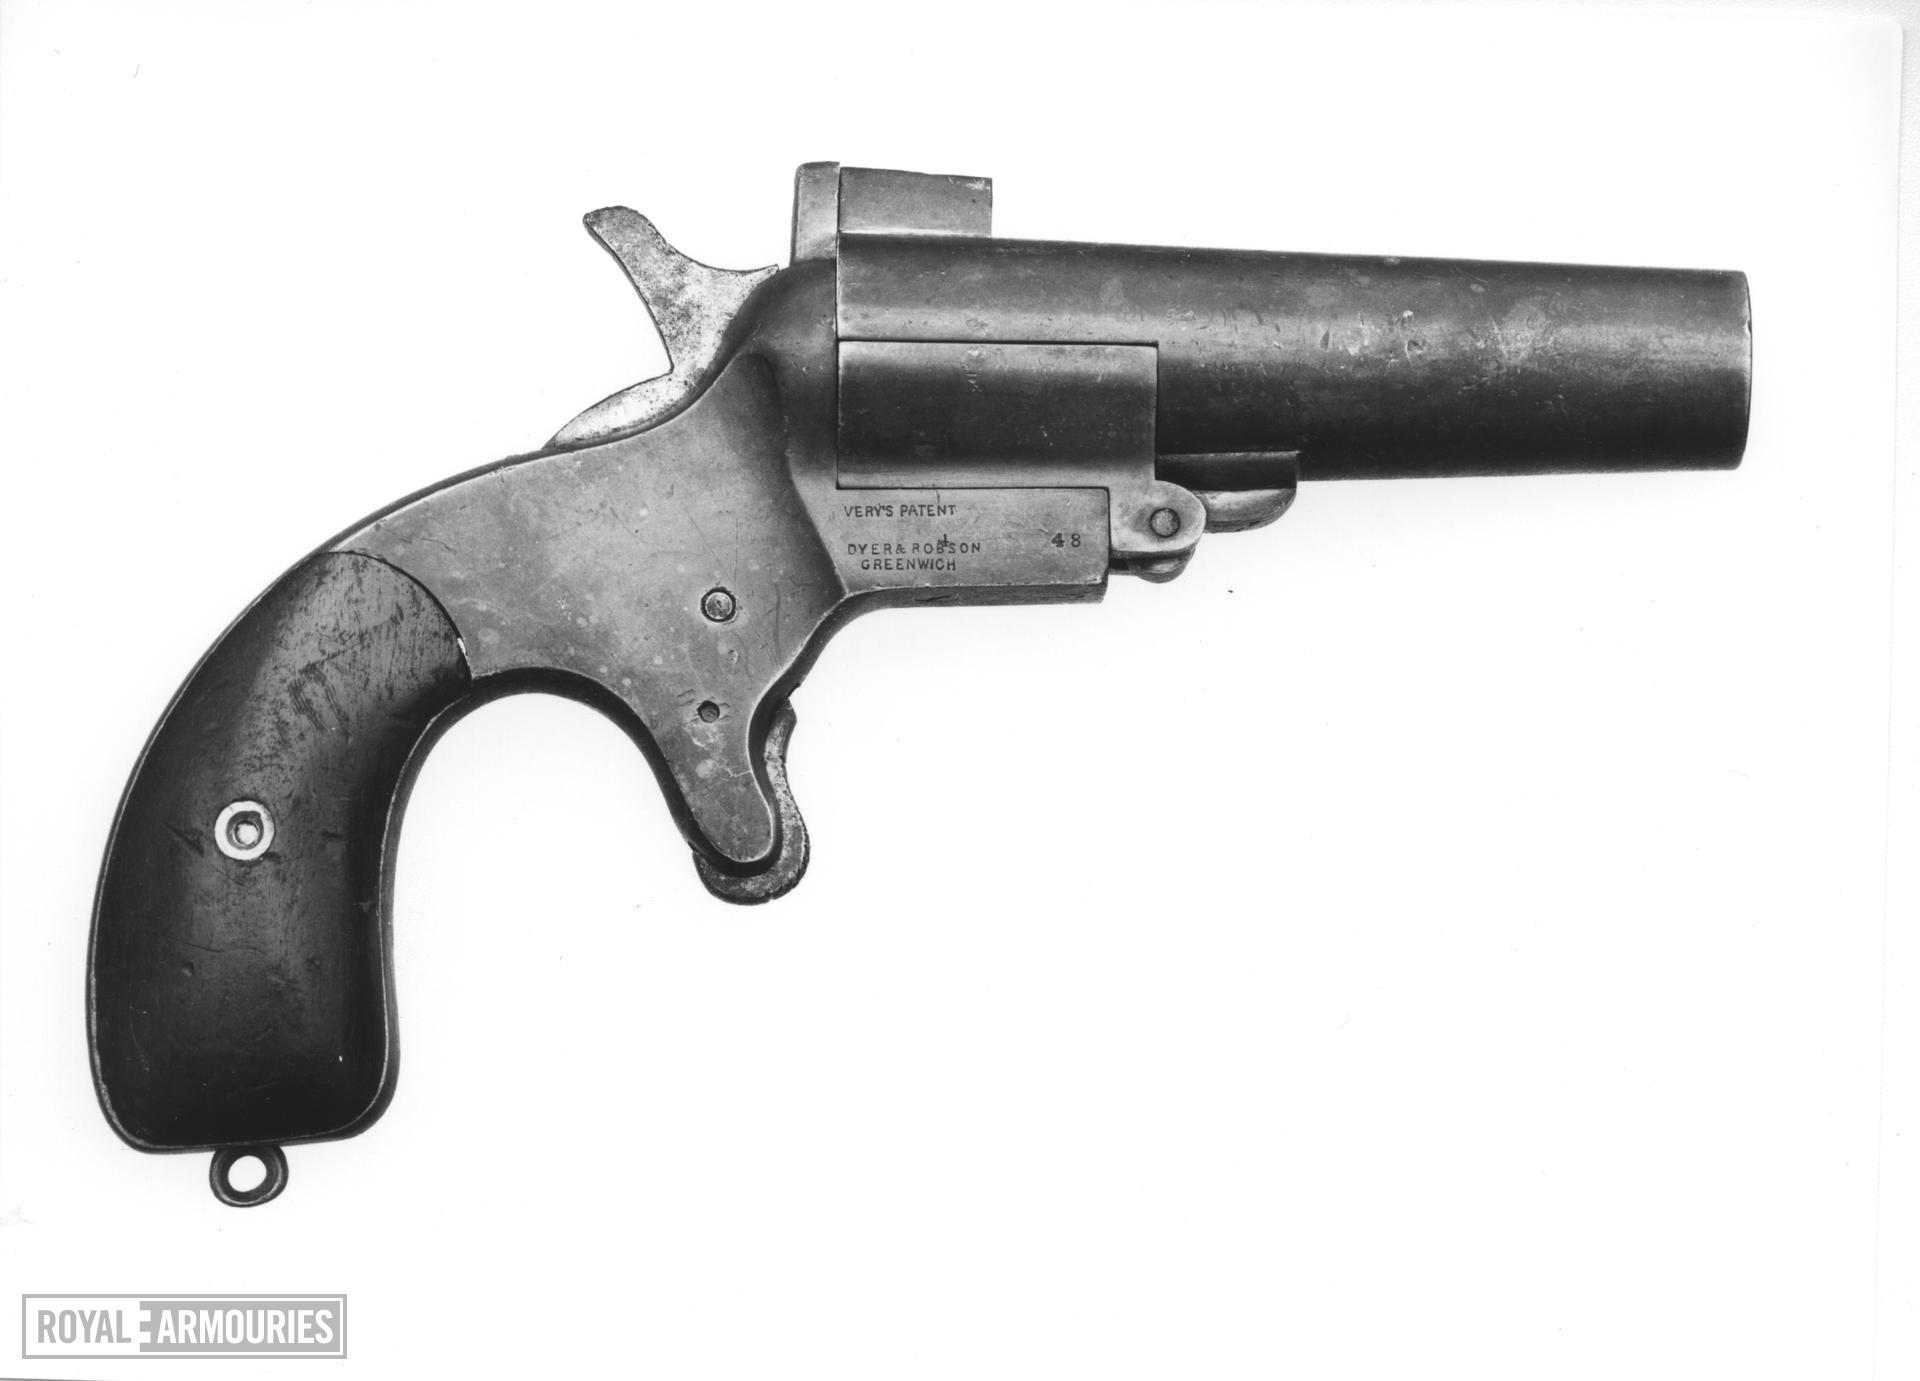 Centrefire breech-loading signal pistol - Dyer and Robinson Patent By Webley & Scott